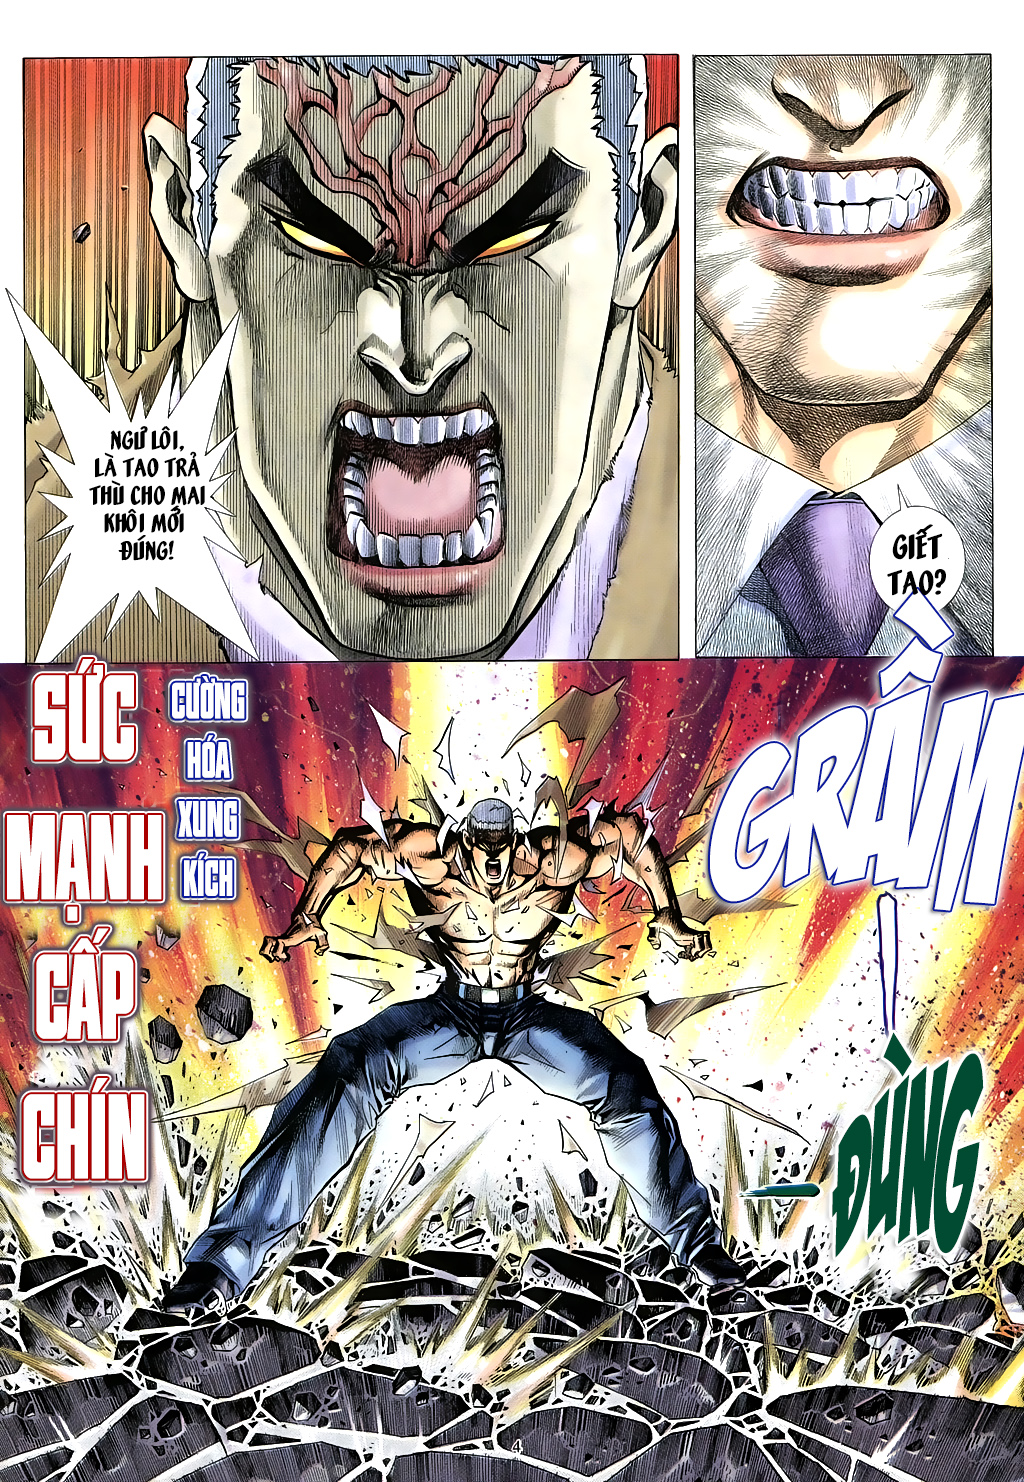 Mạt Nhật Chiến Lang Chap 59 - Next Chap 60 image 4